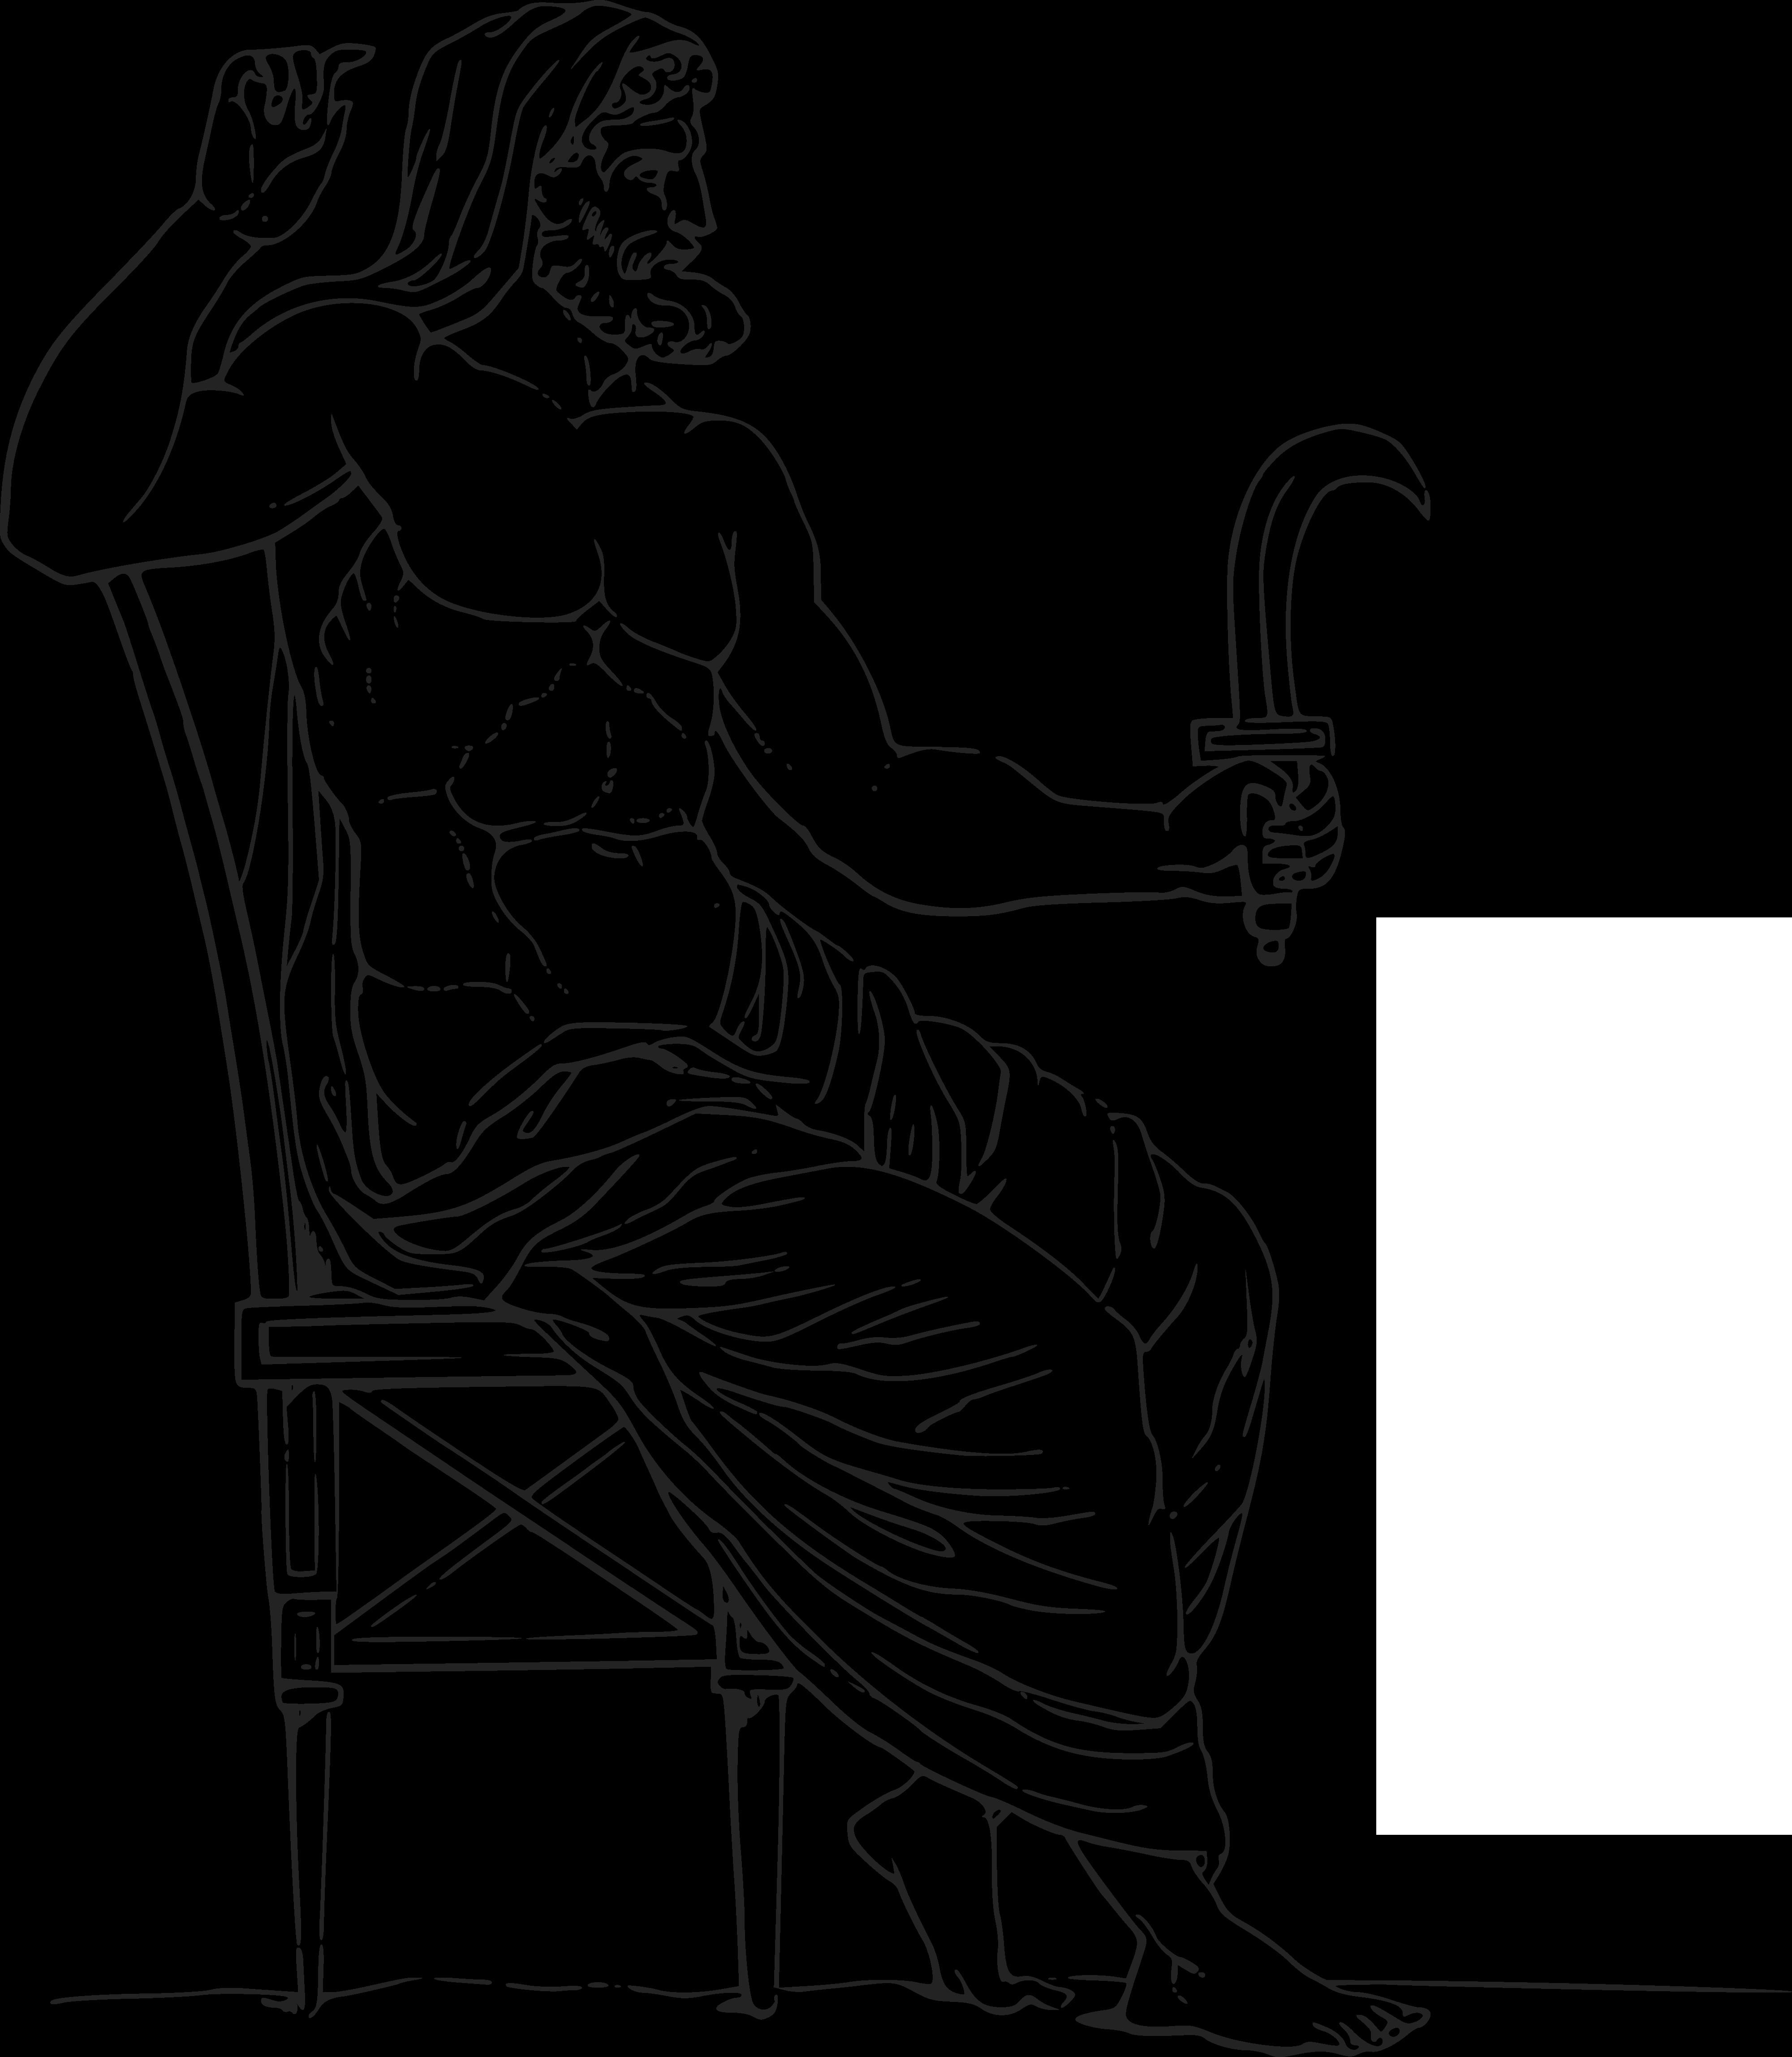 free clipart of a black and white greek mythology god cronus Poseidon Greek God free clipart of a black and white greek mythology god cronus 0001348